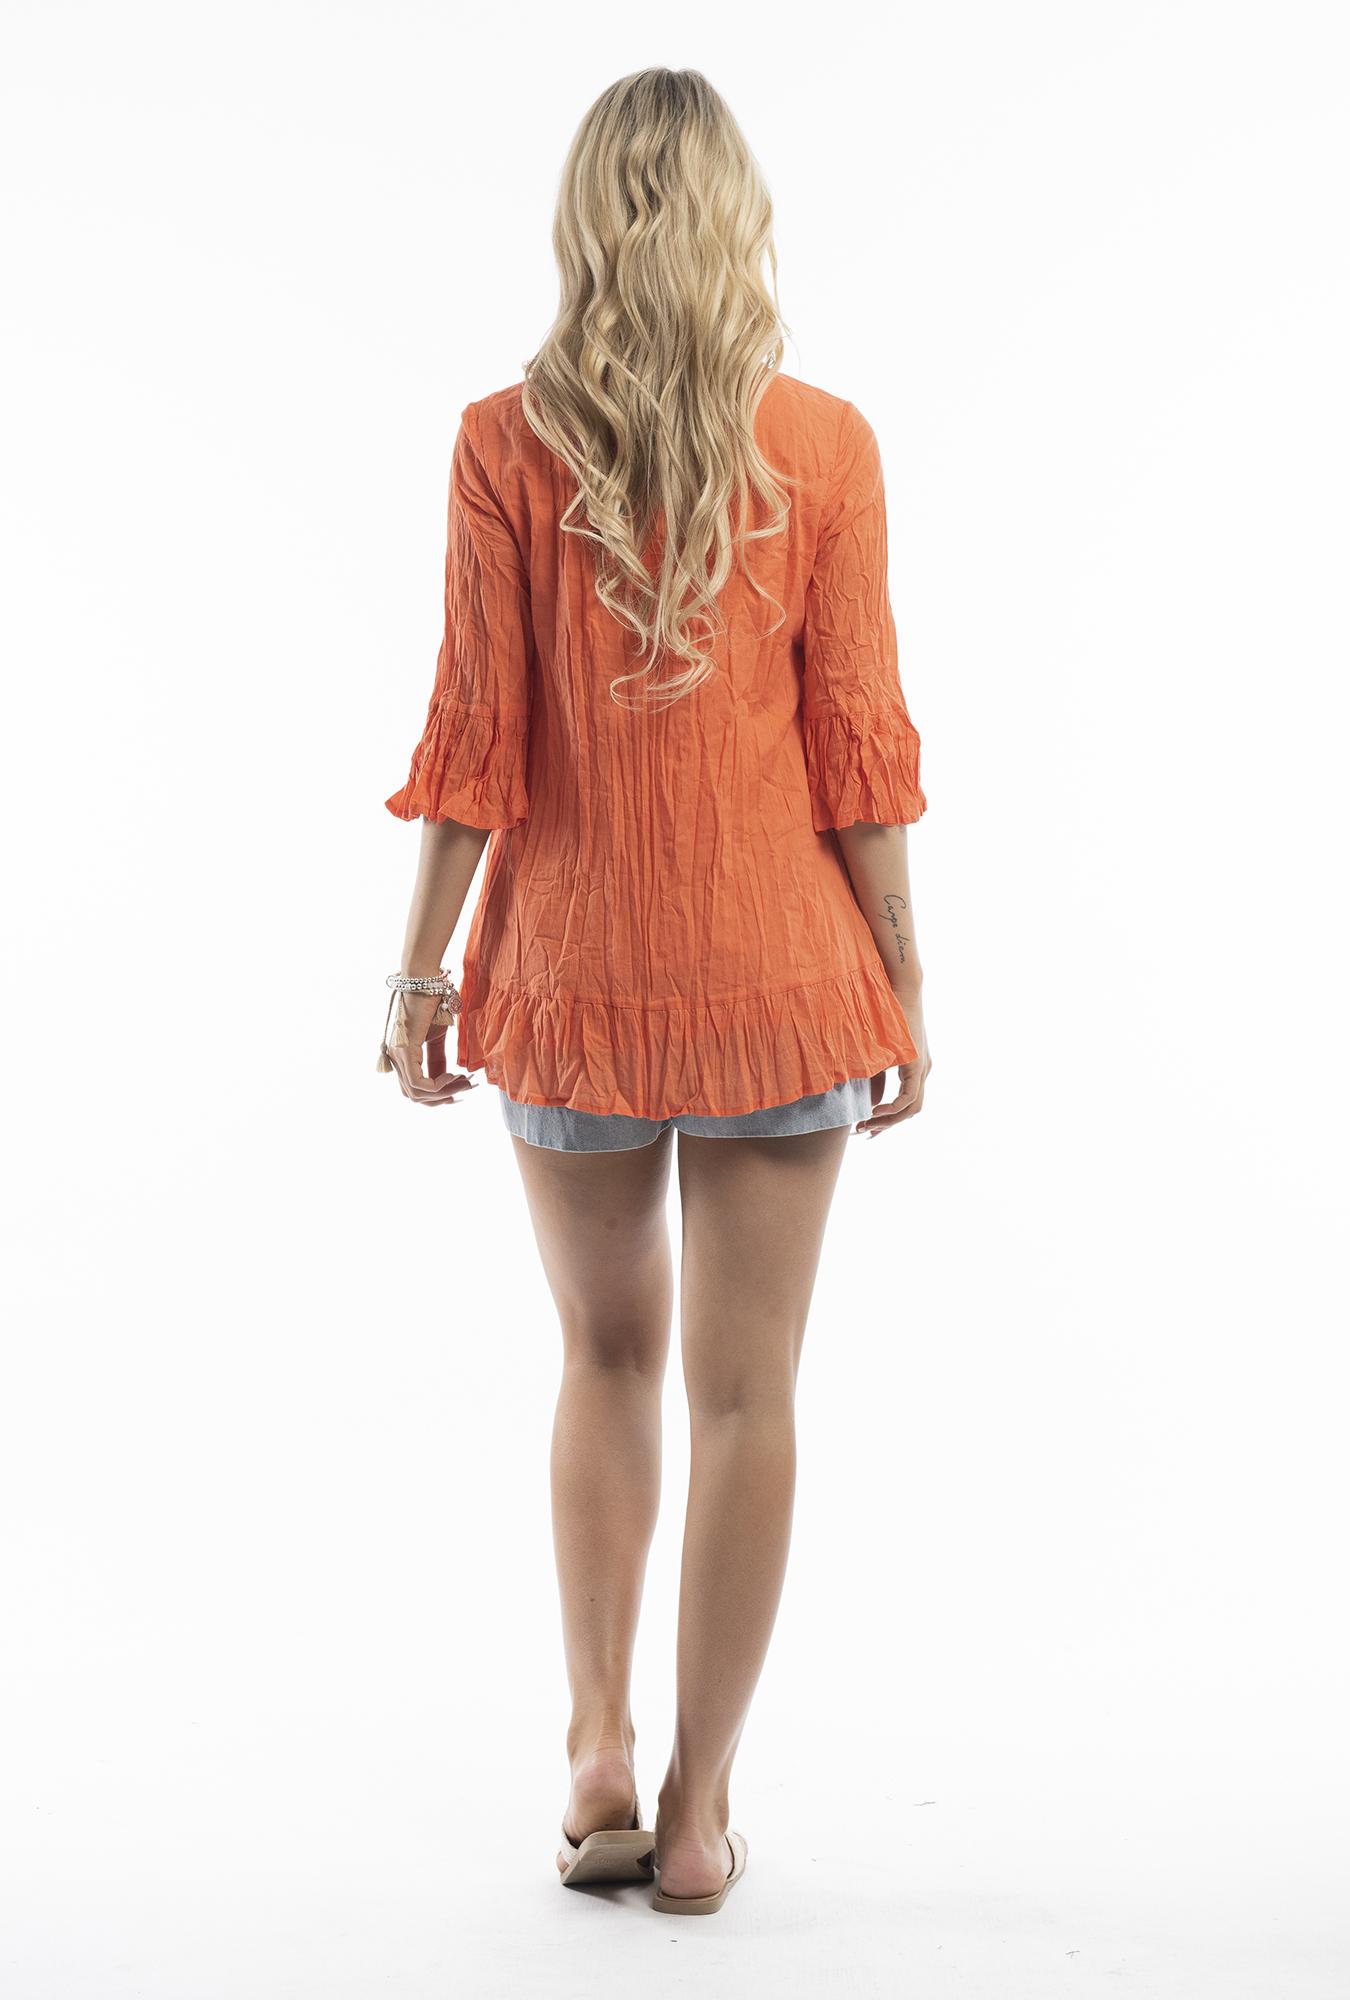 Xanthe Tunic in Orange